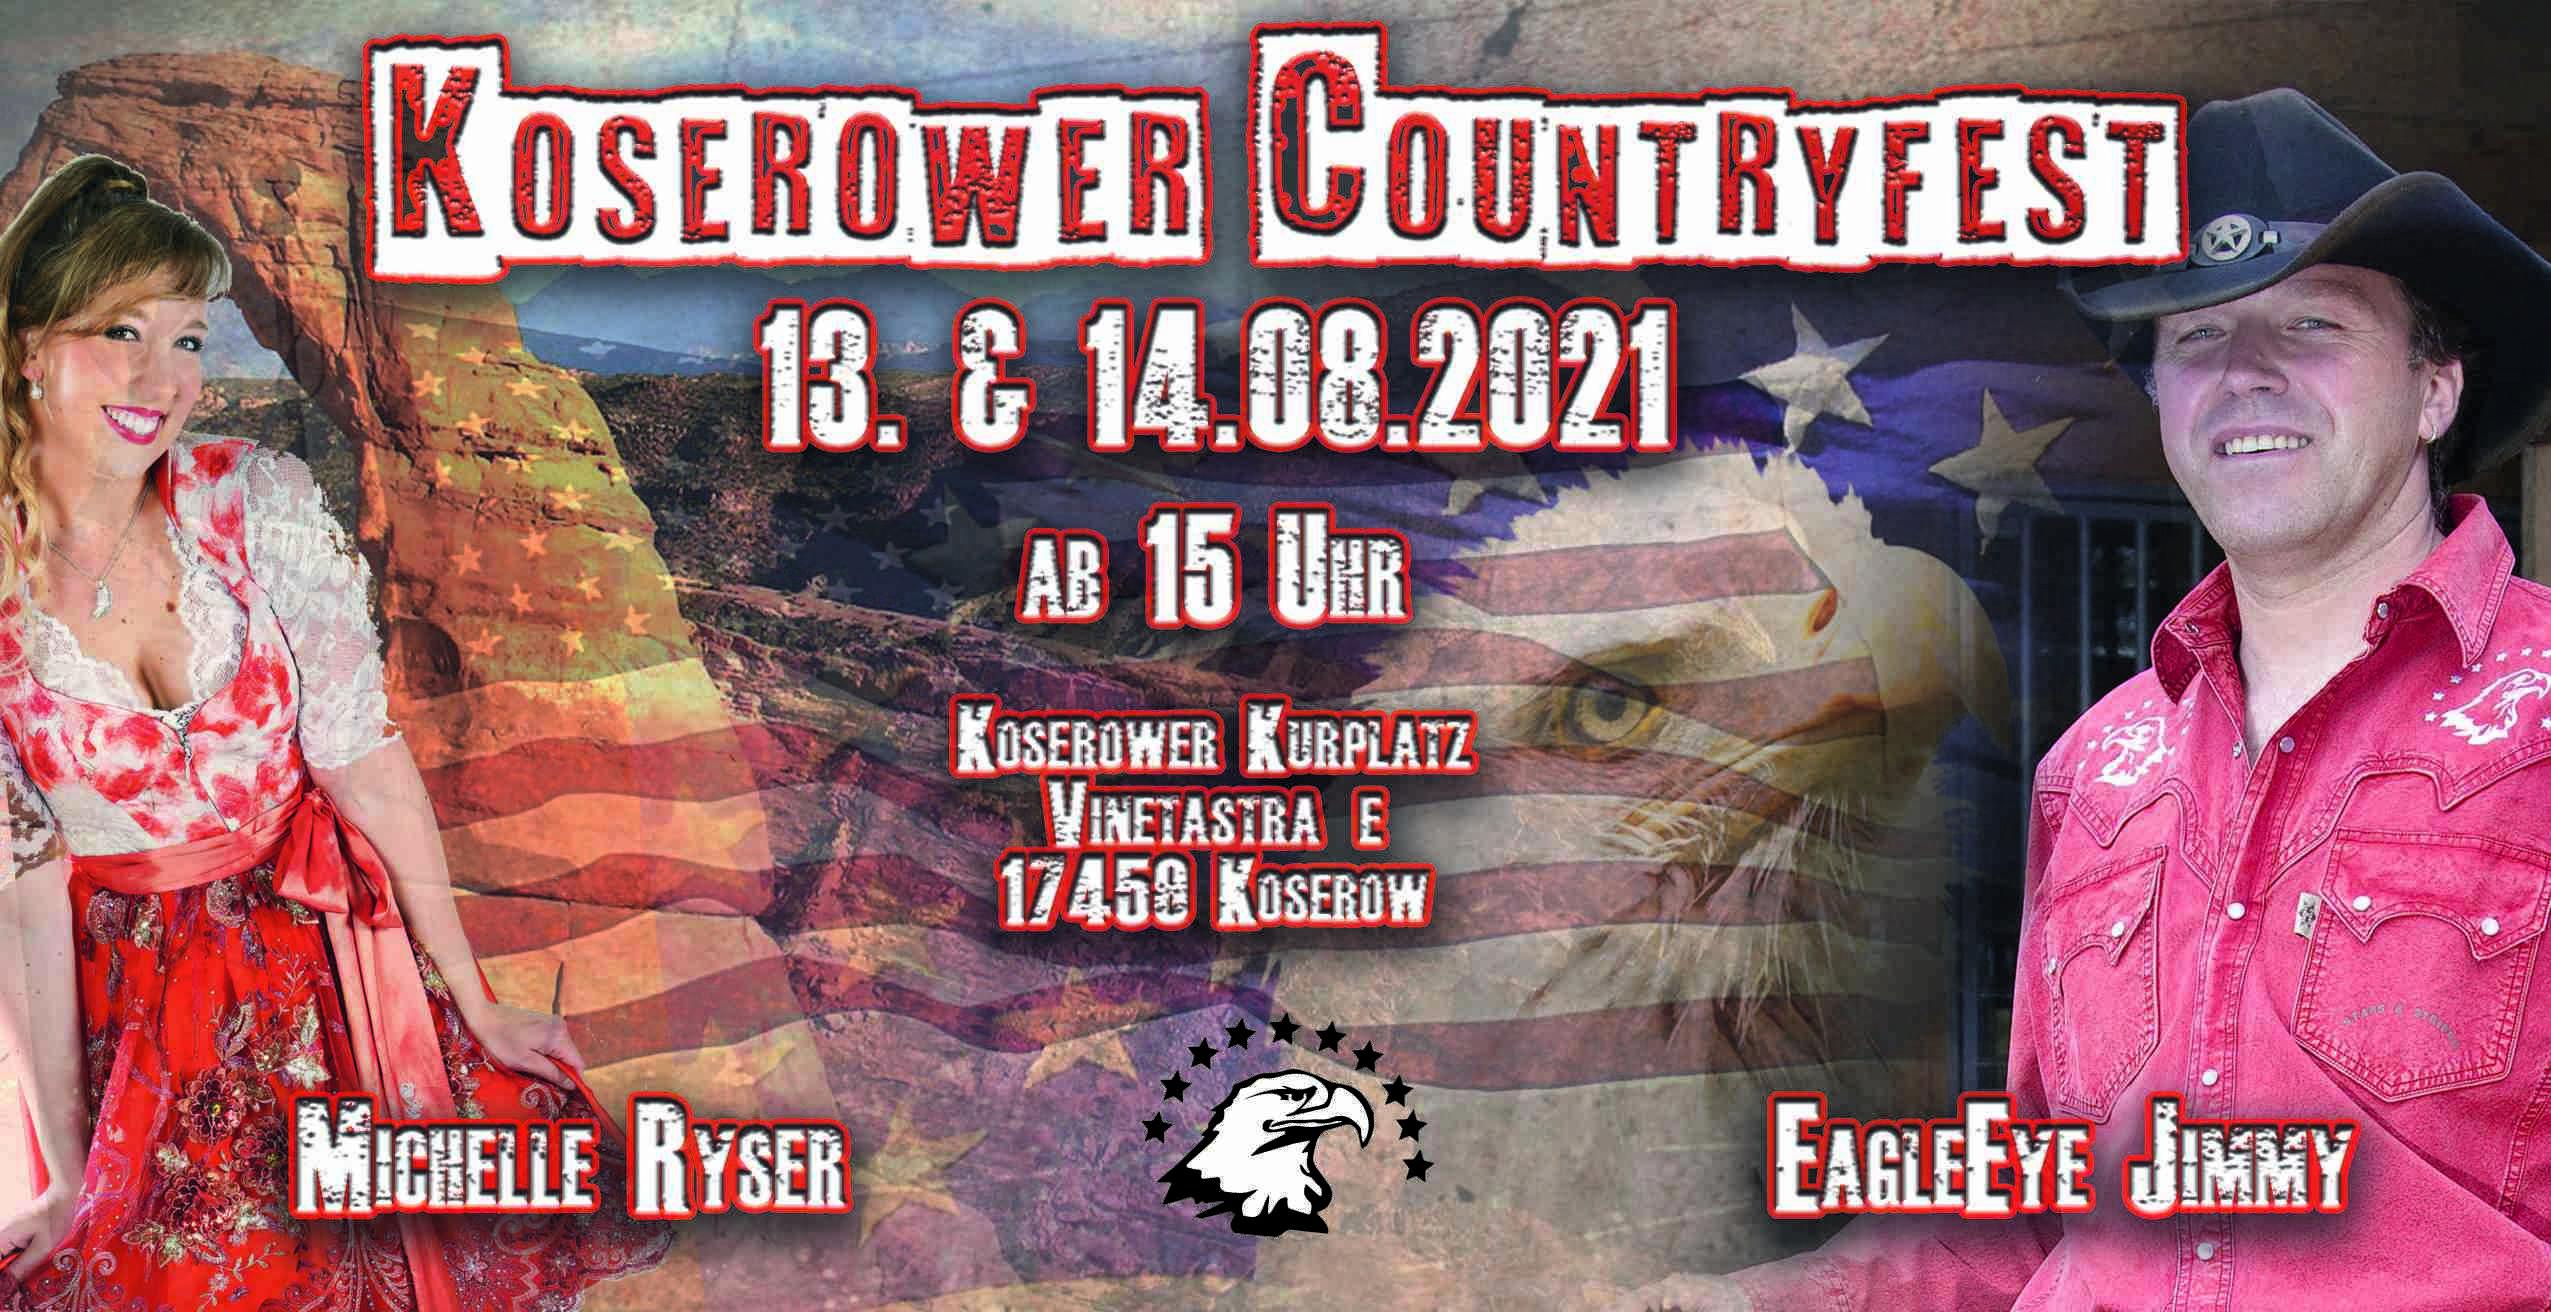 Koserower Countryfest